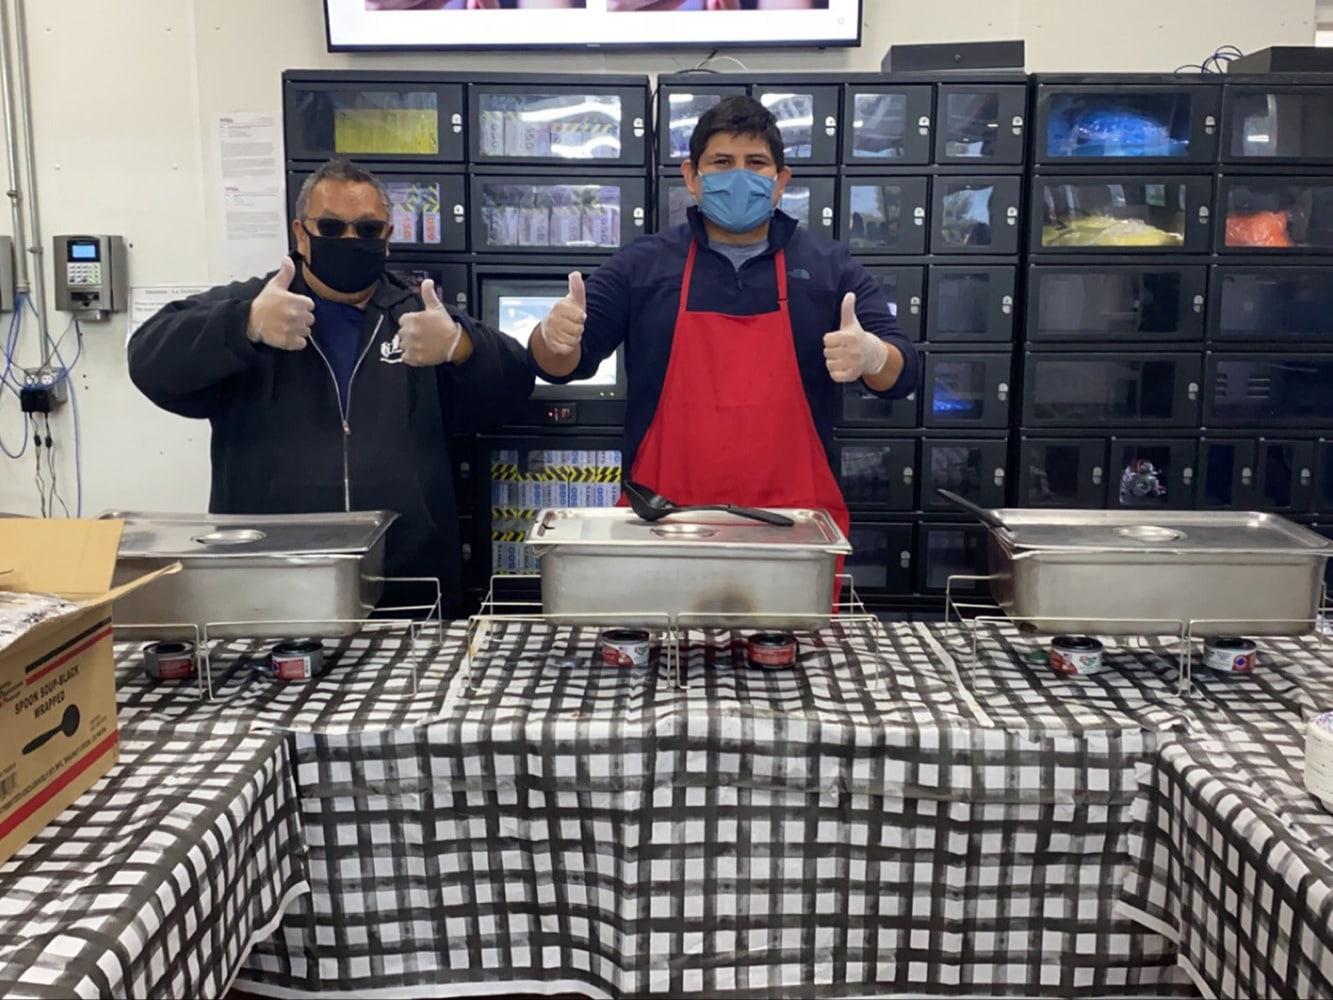 Bristol chili cook off winner